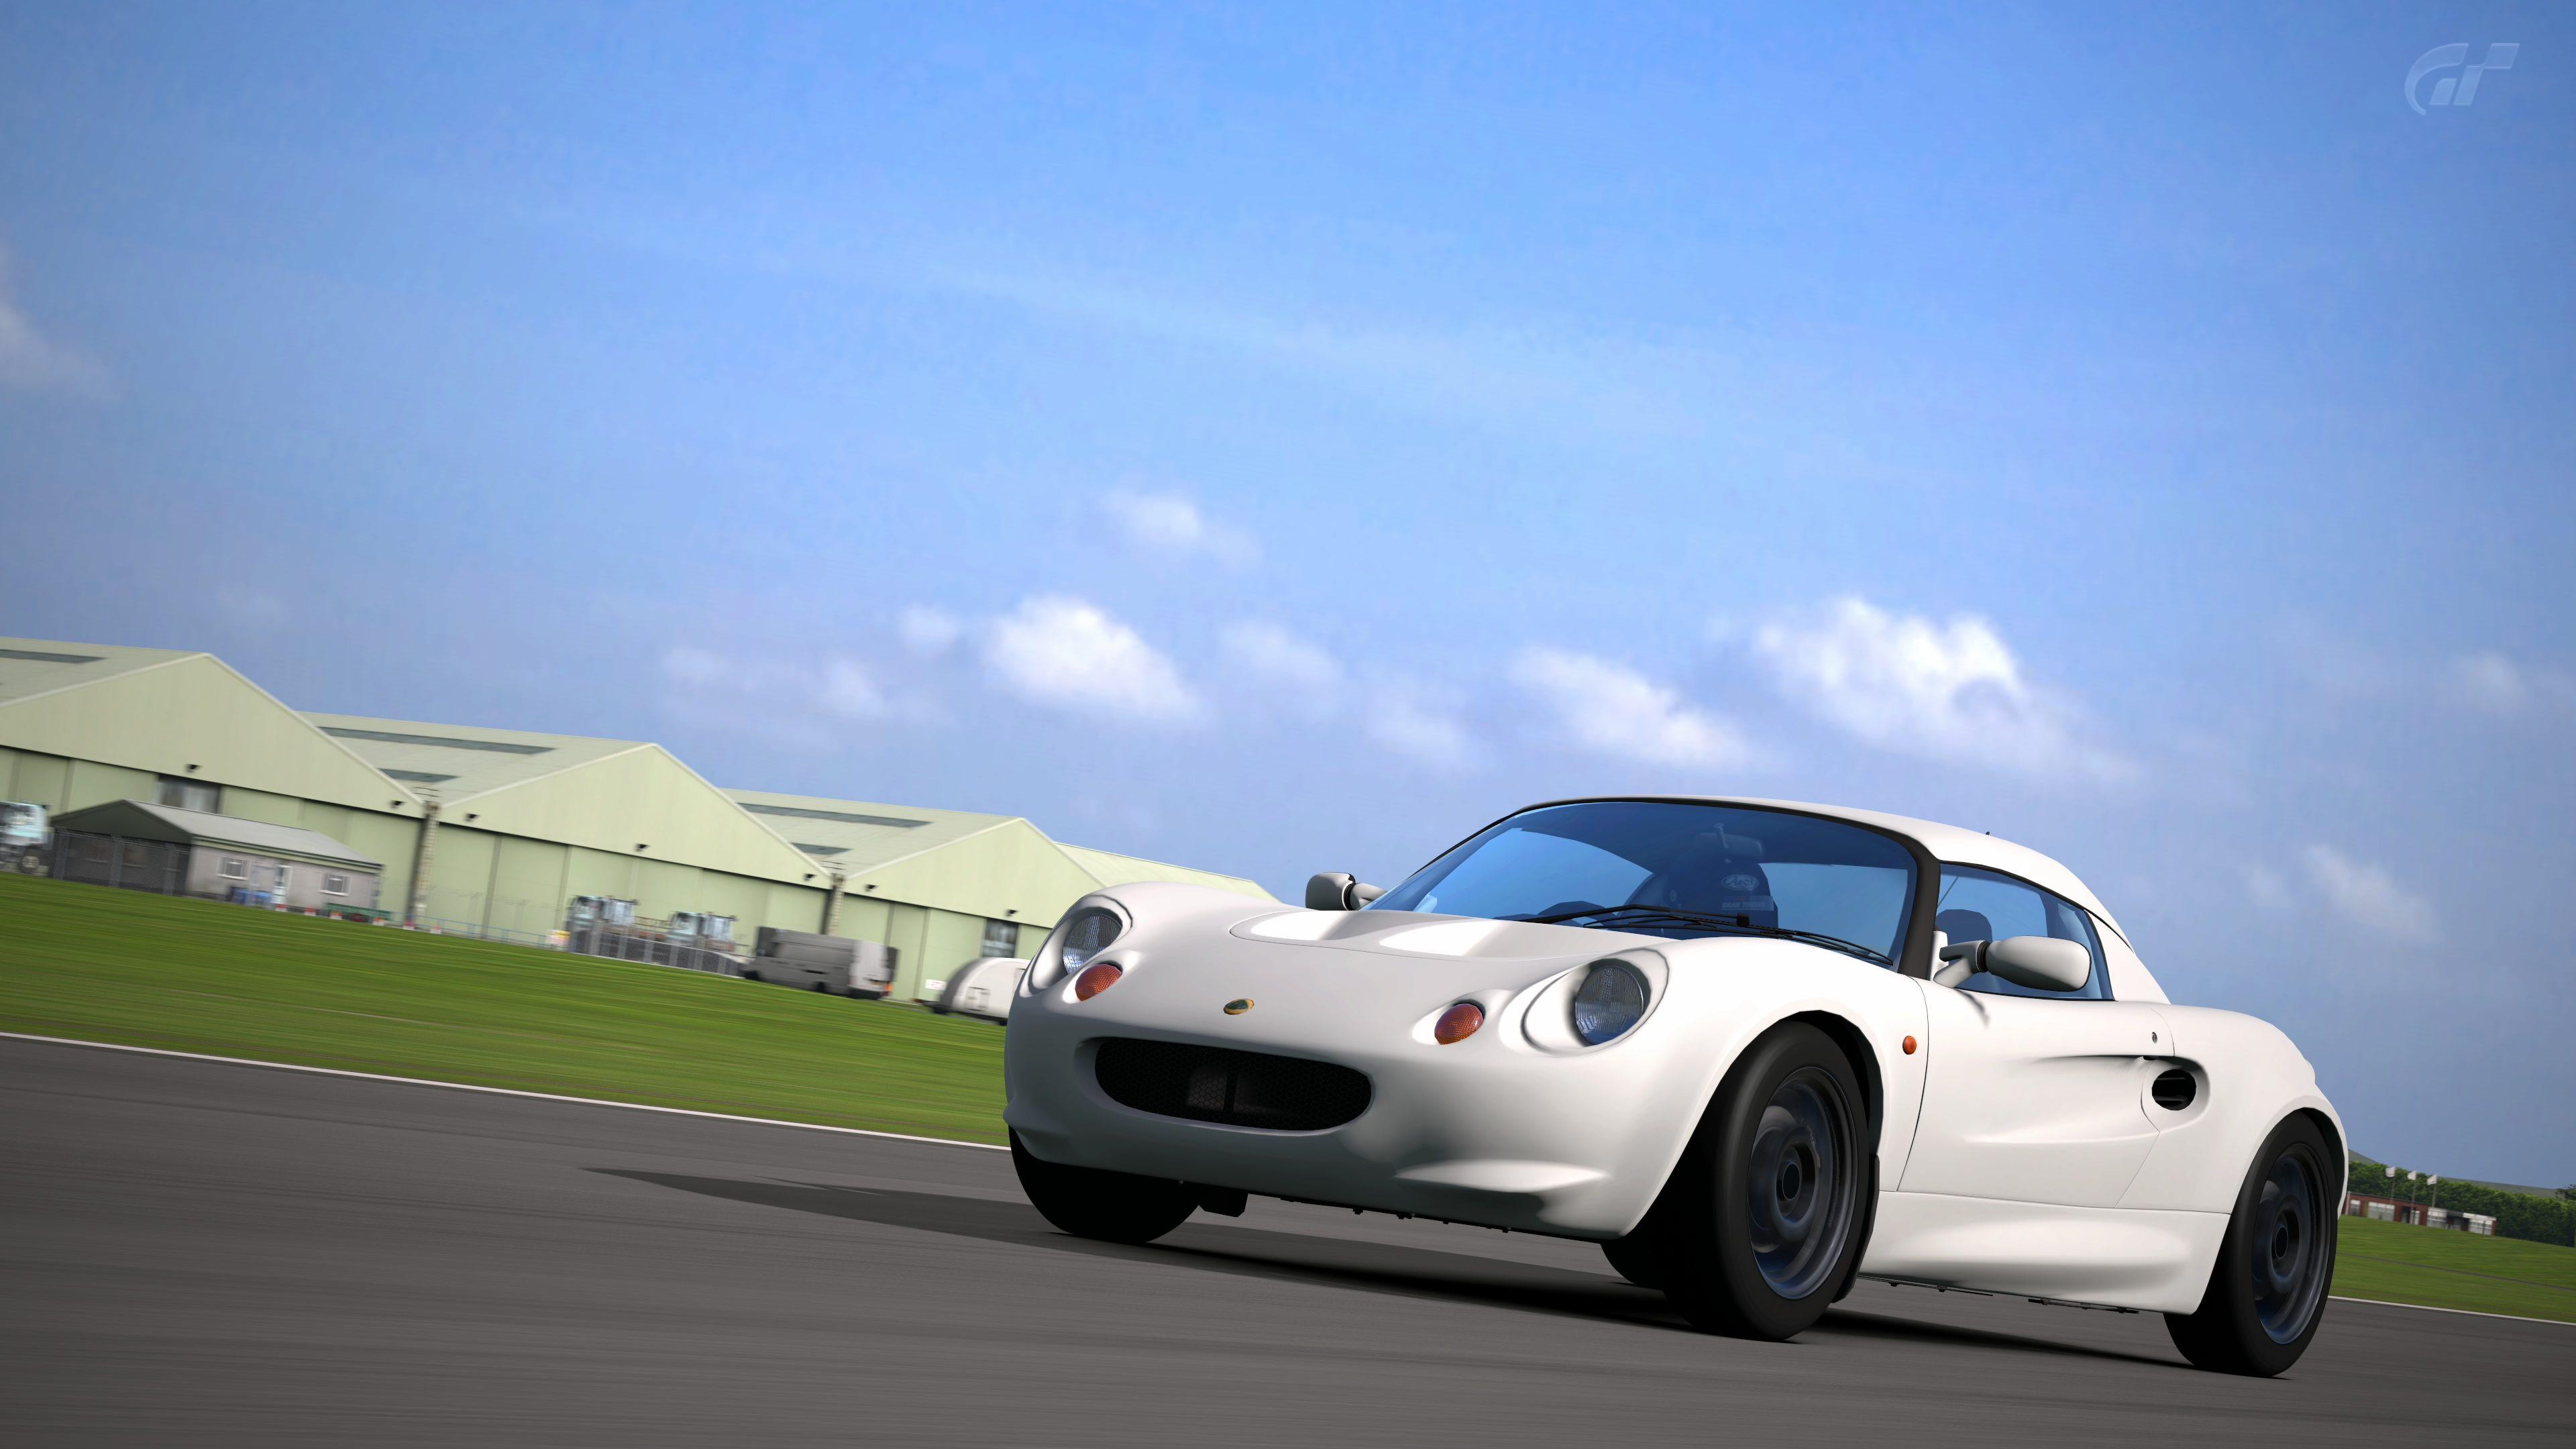 The Top Gear Test Track.jpg